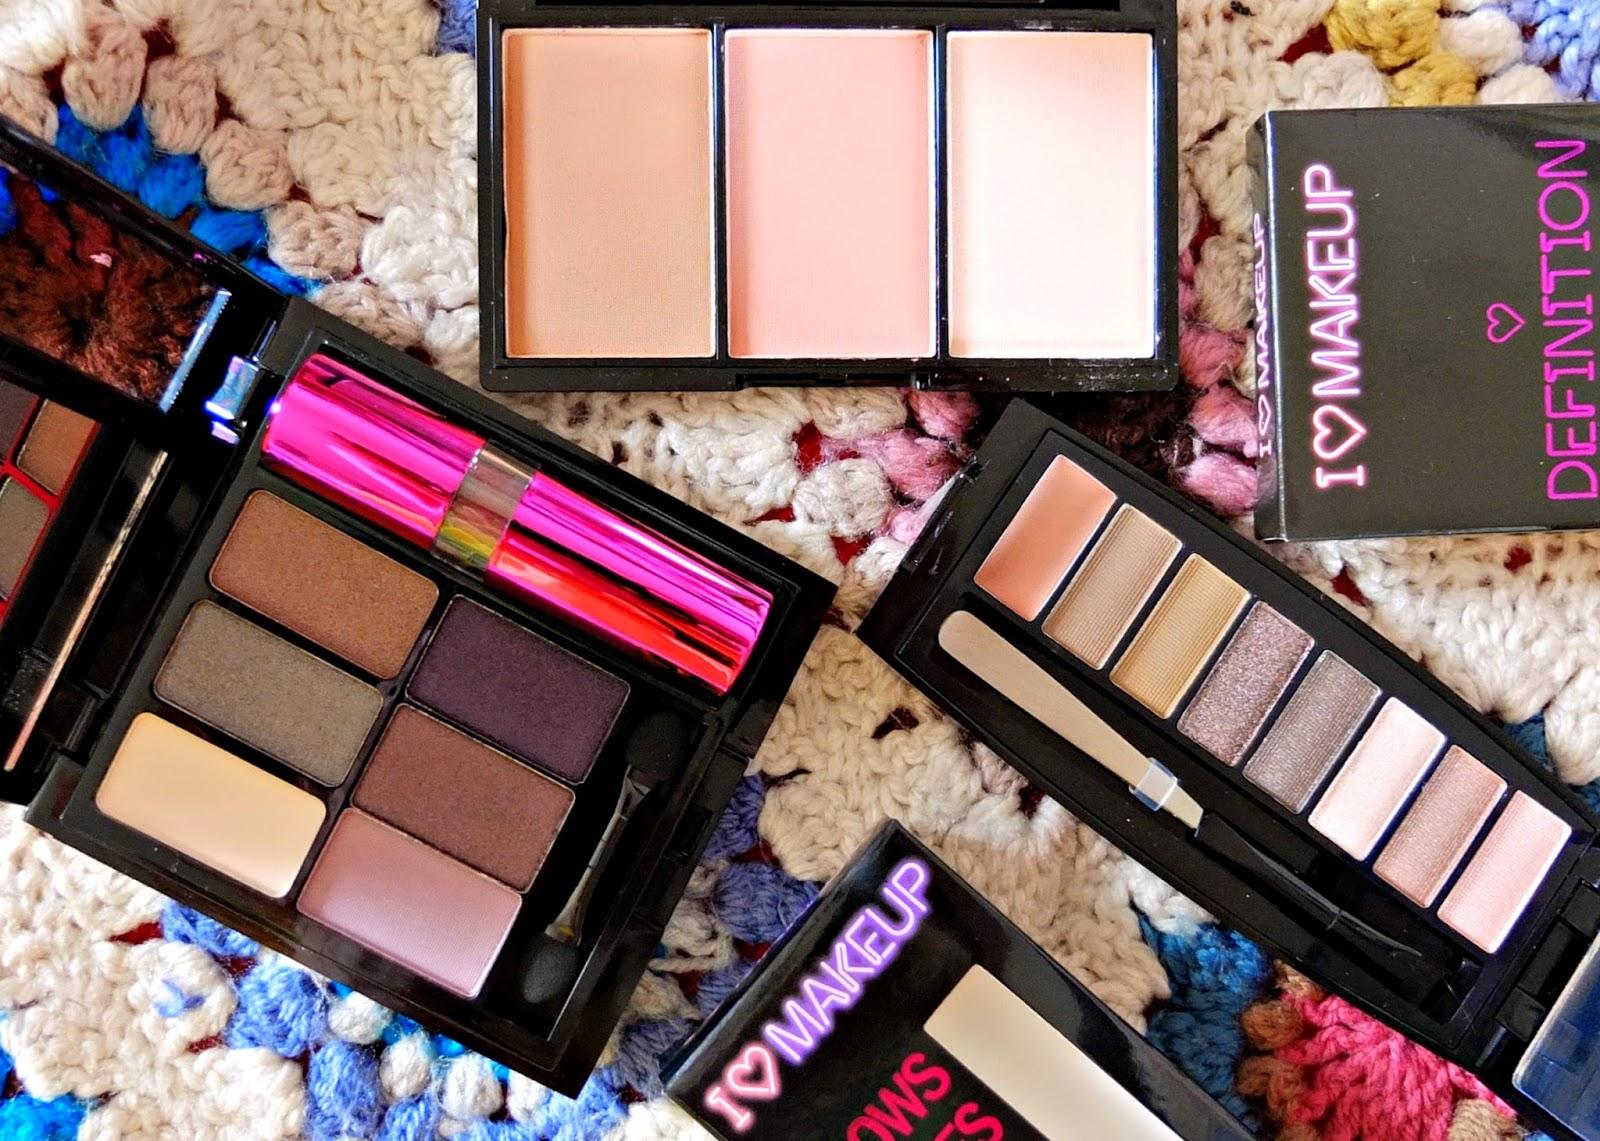 Blog Review of I Heart Make Up - Sister brand to budget beauty brand Make Up Revolution on UK beauty blog.